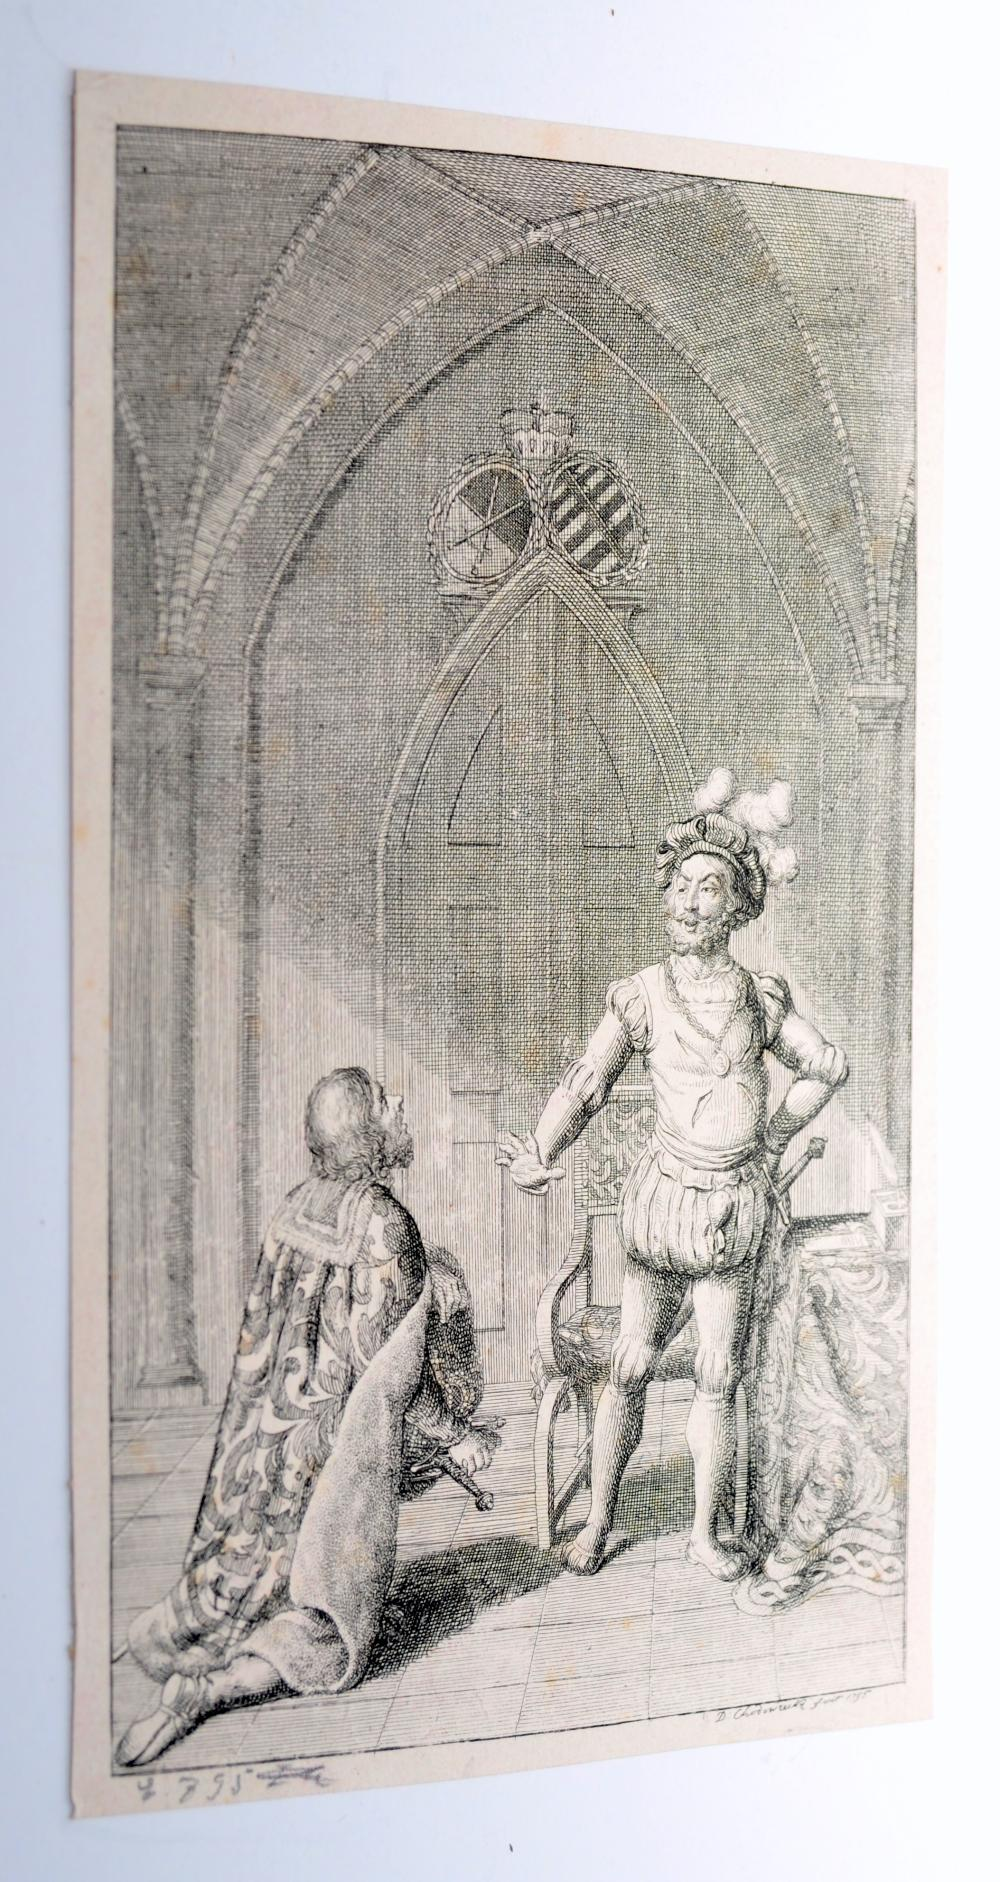 Chodowiecki etching signed 1795